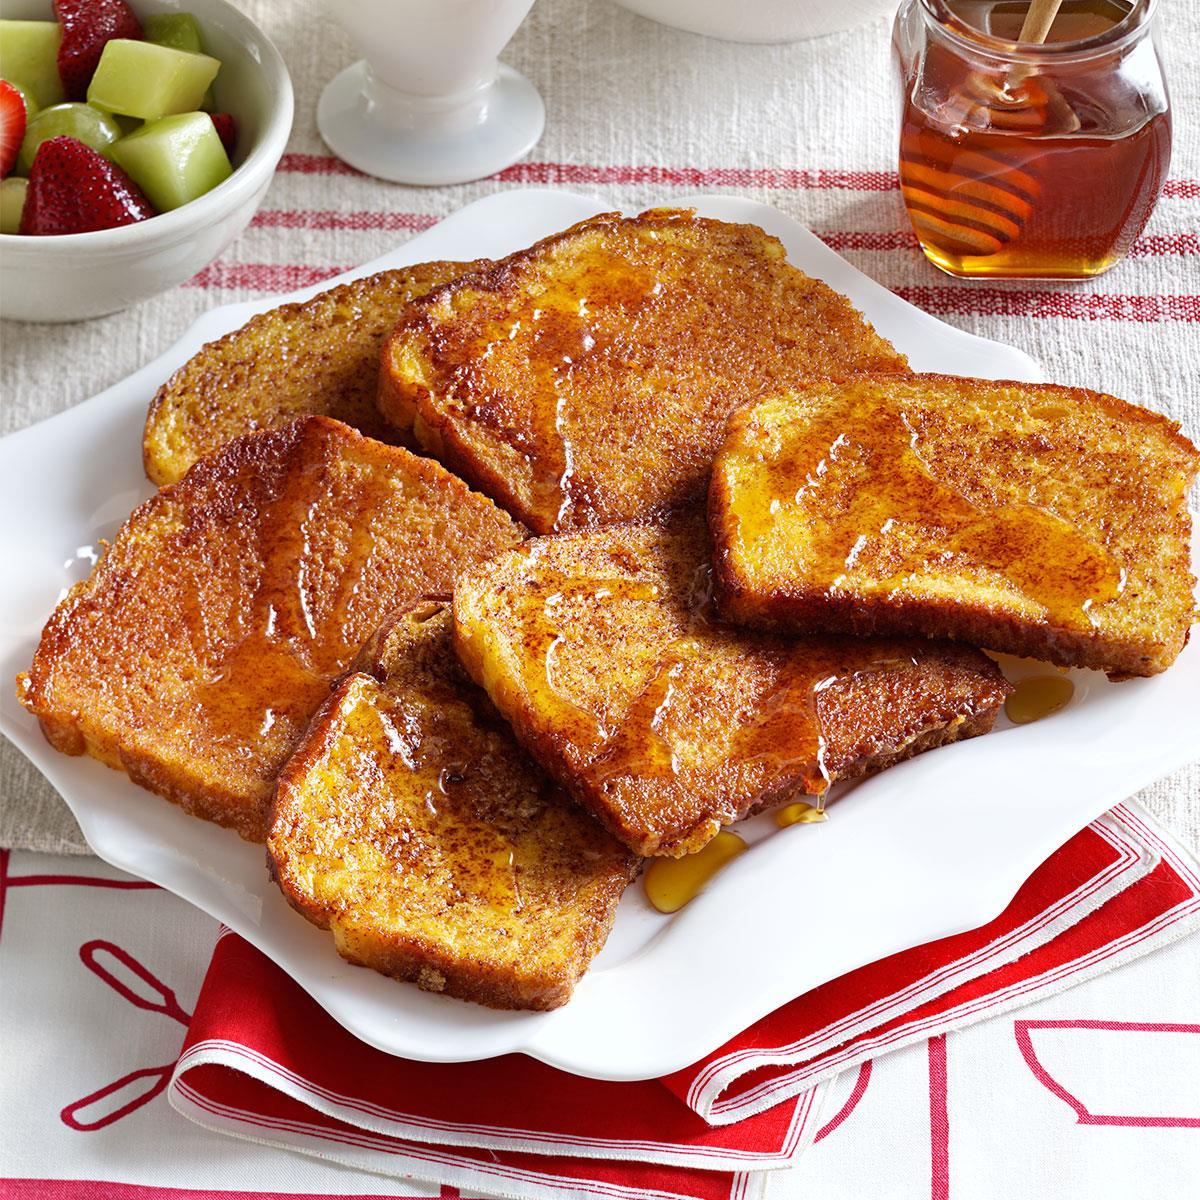 Orange-Cinnamon French Toast Recipe